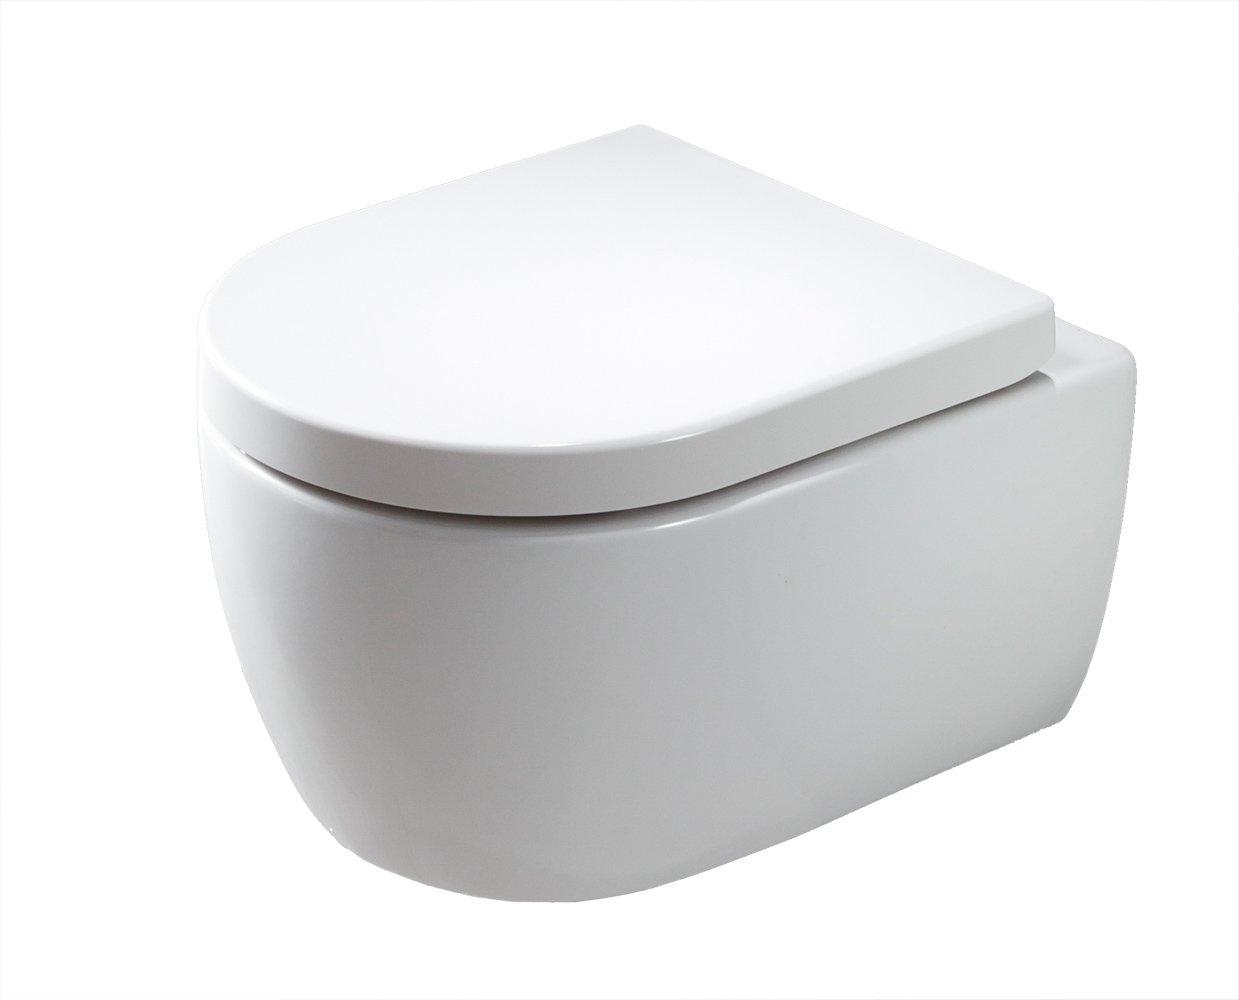 Spülrandloses Wand-Hänge WC NANO NT2039 - inkl. Softclose-Deckel